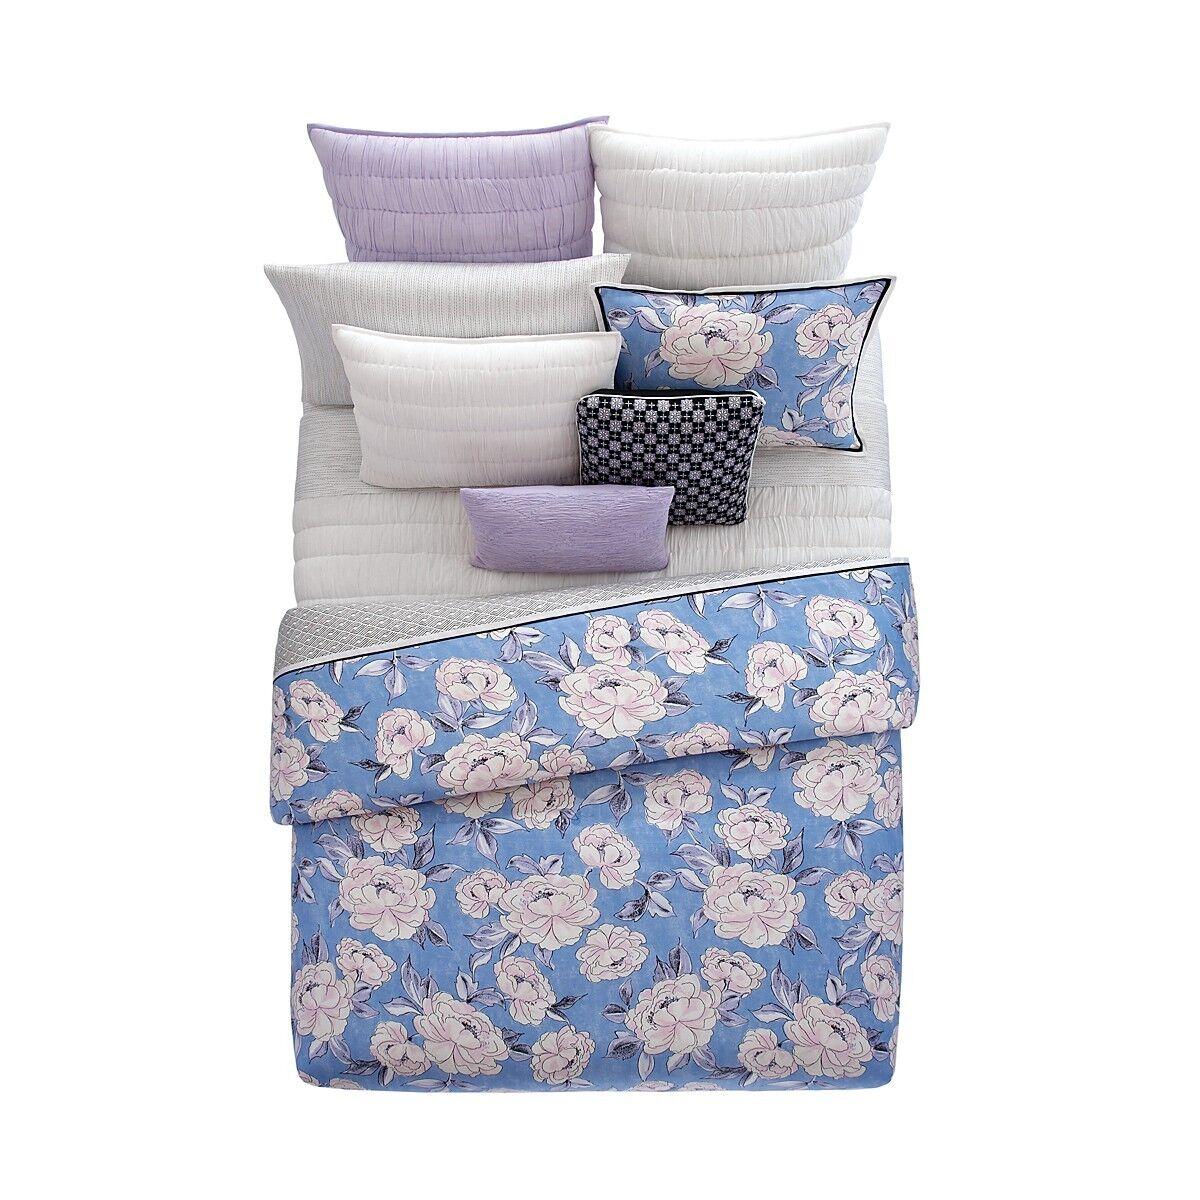 SKY Bedding Fiona 230 Thread Count 100% Cotton TWIN Sheet Set  110 D5168